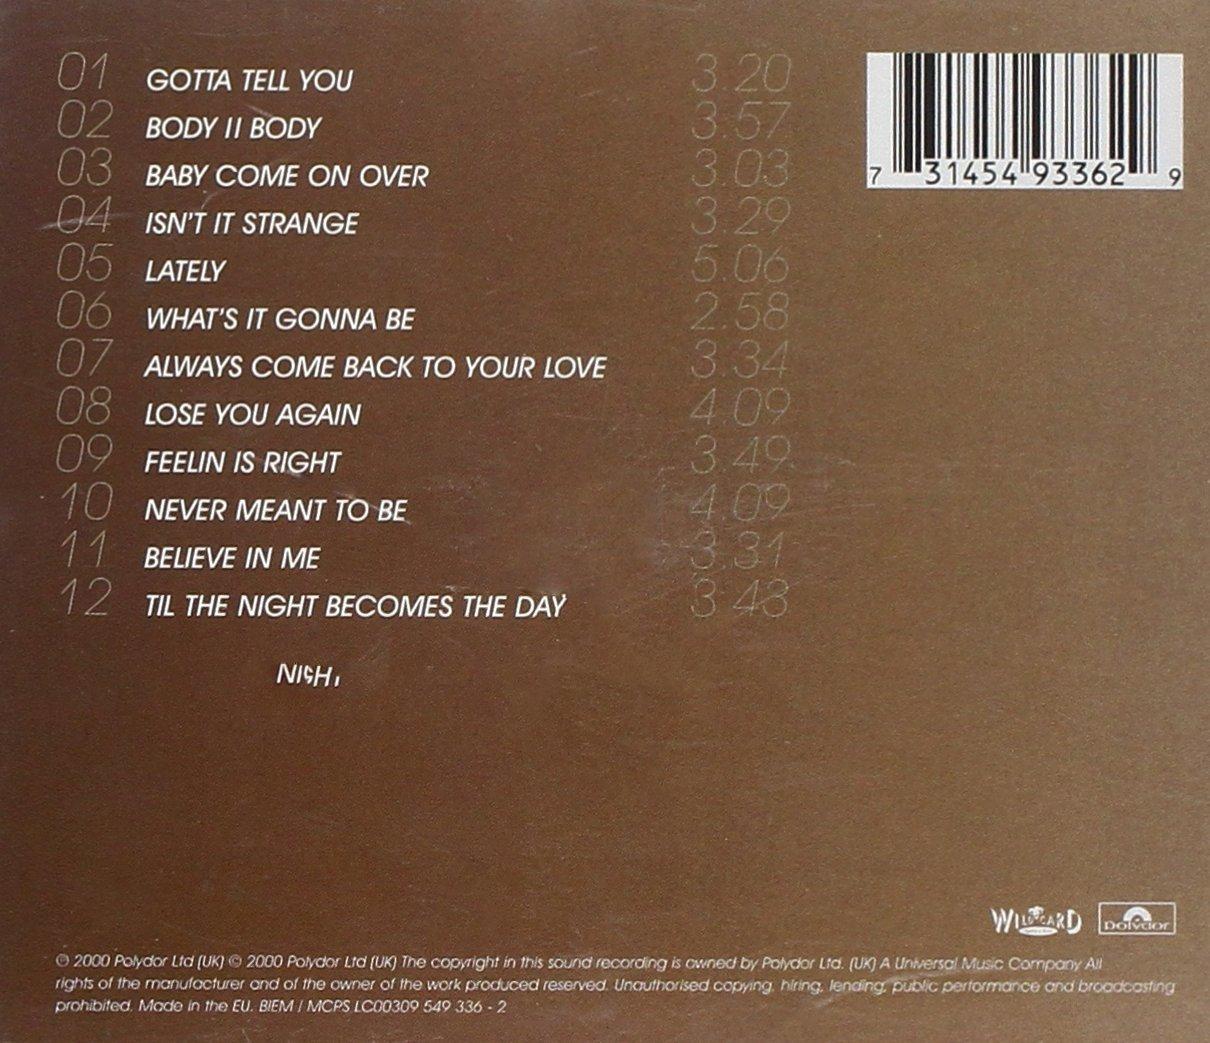 Gotta Tell You - Samantha Mumba: Amazon.de: Musik